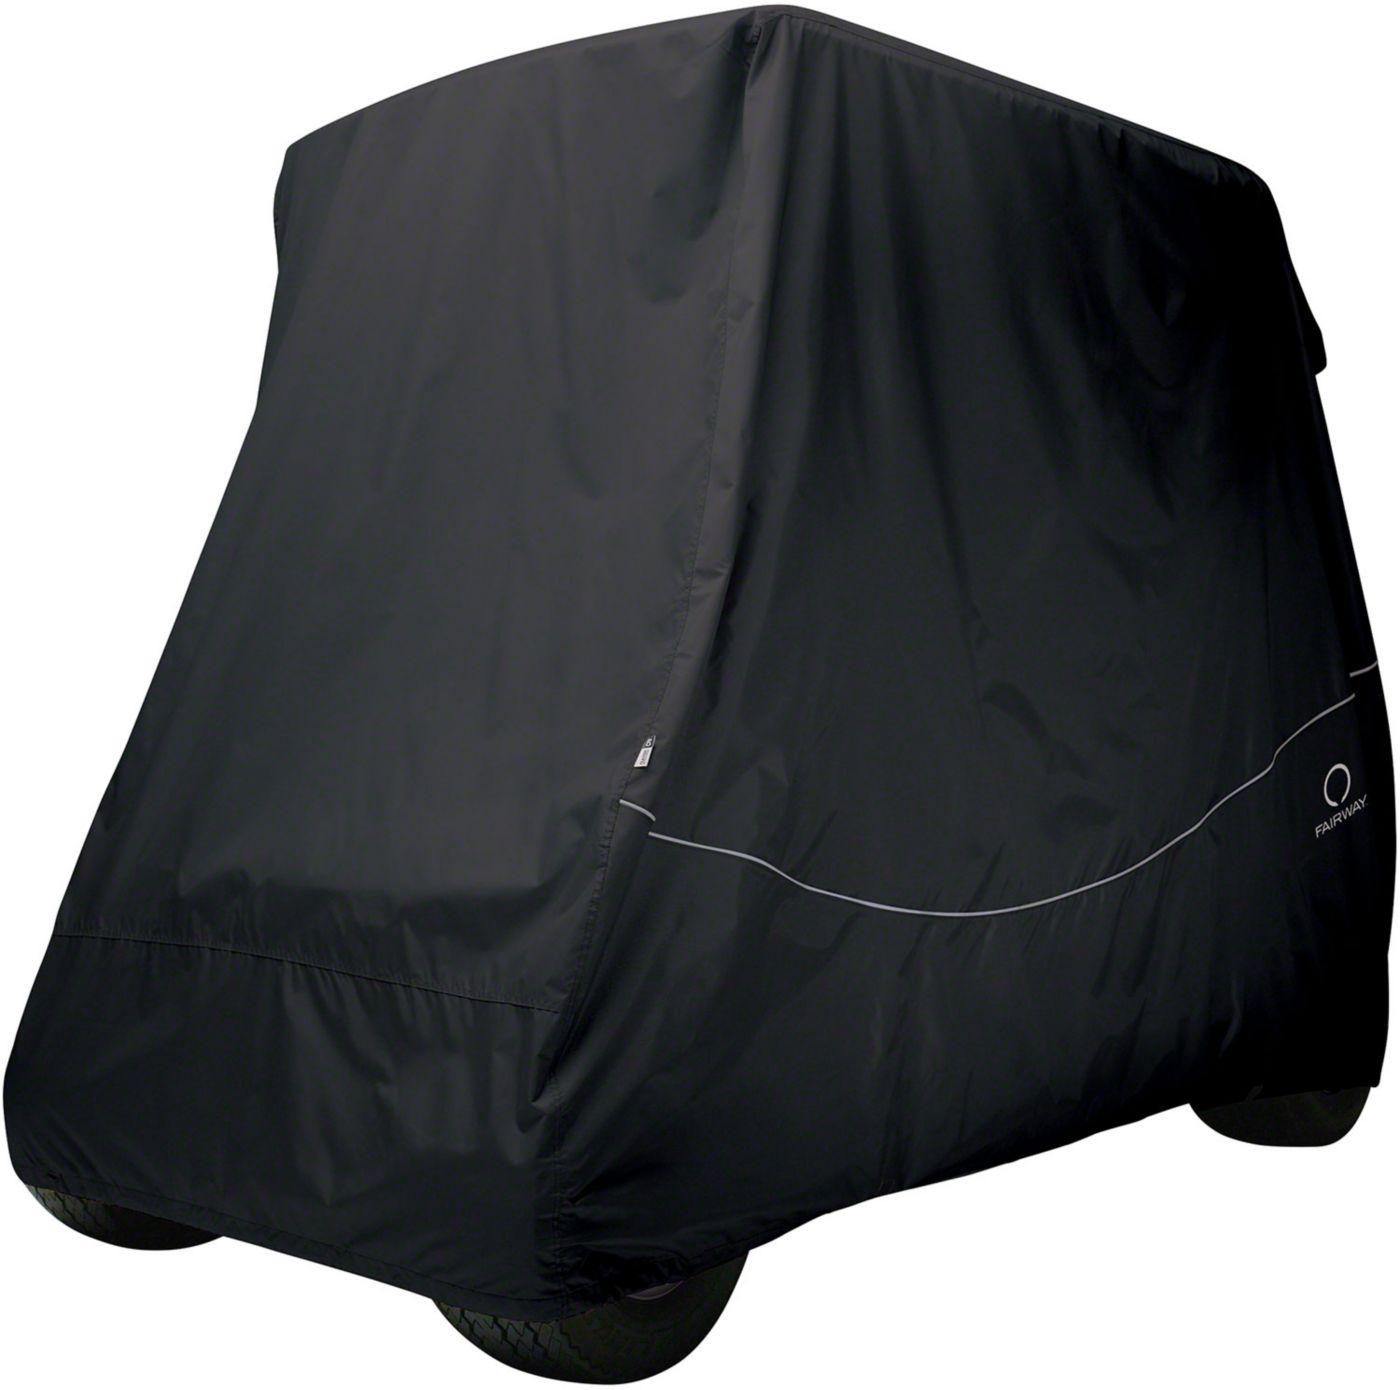 Classic Accessories Fairway Quick-Fit Short Golf Cart Cover - Black